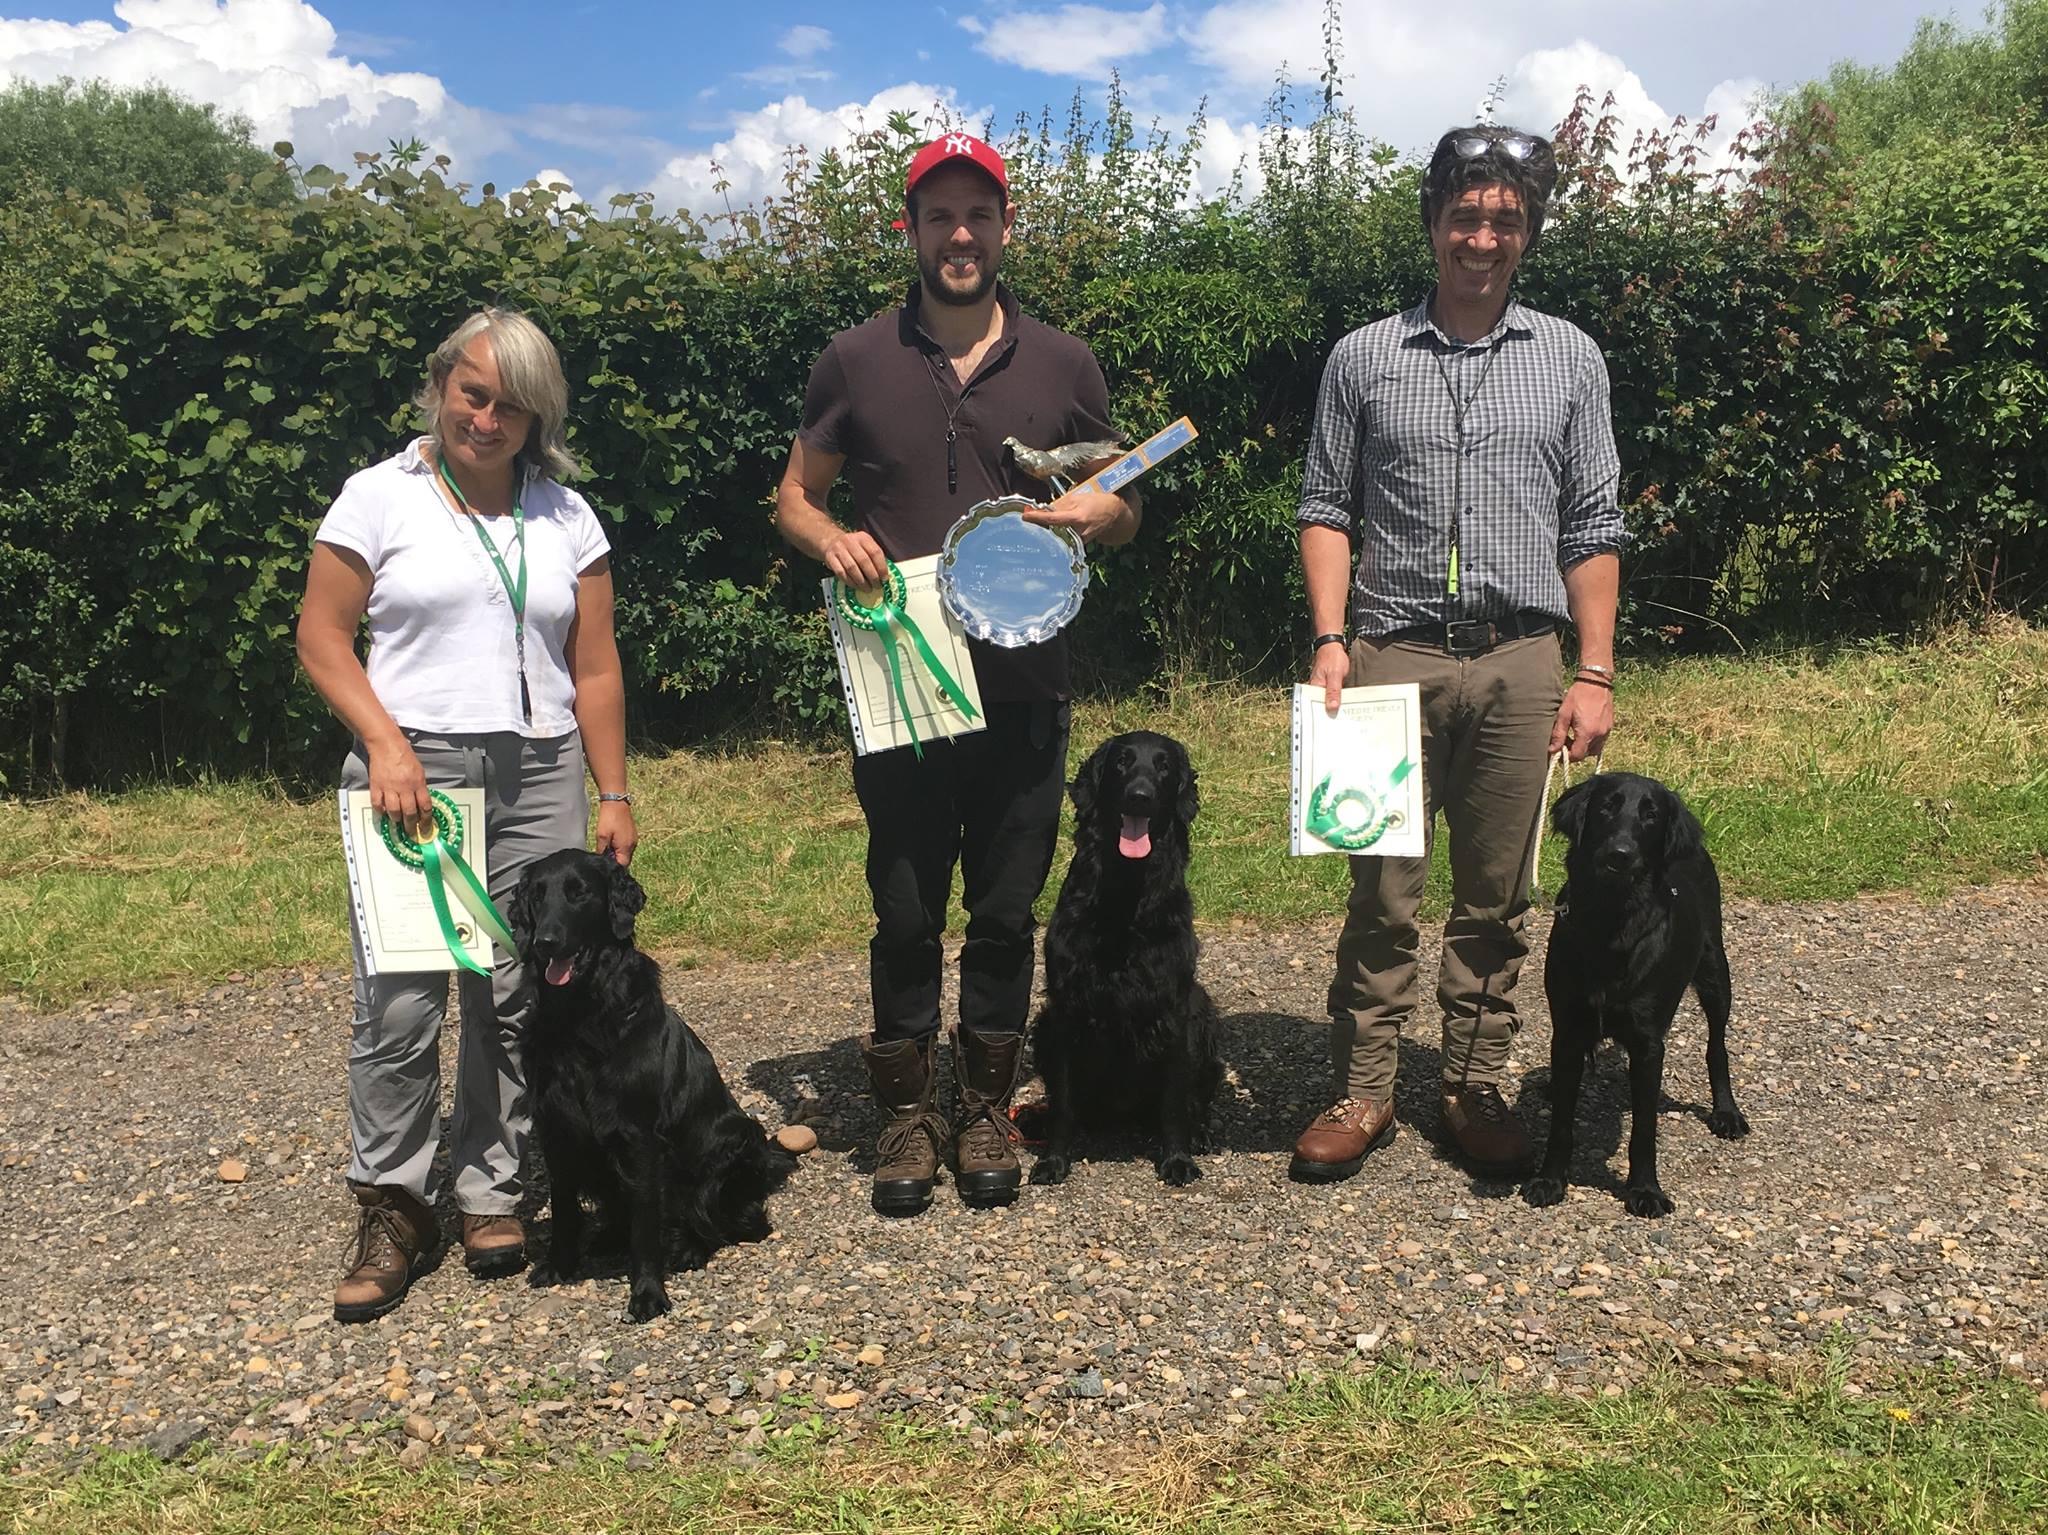 Caroline Hewison, Lewis Holton & Andy Sweeney NOVICE prizewinners